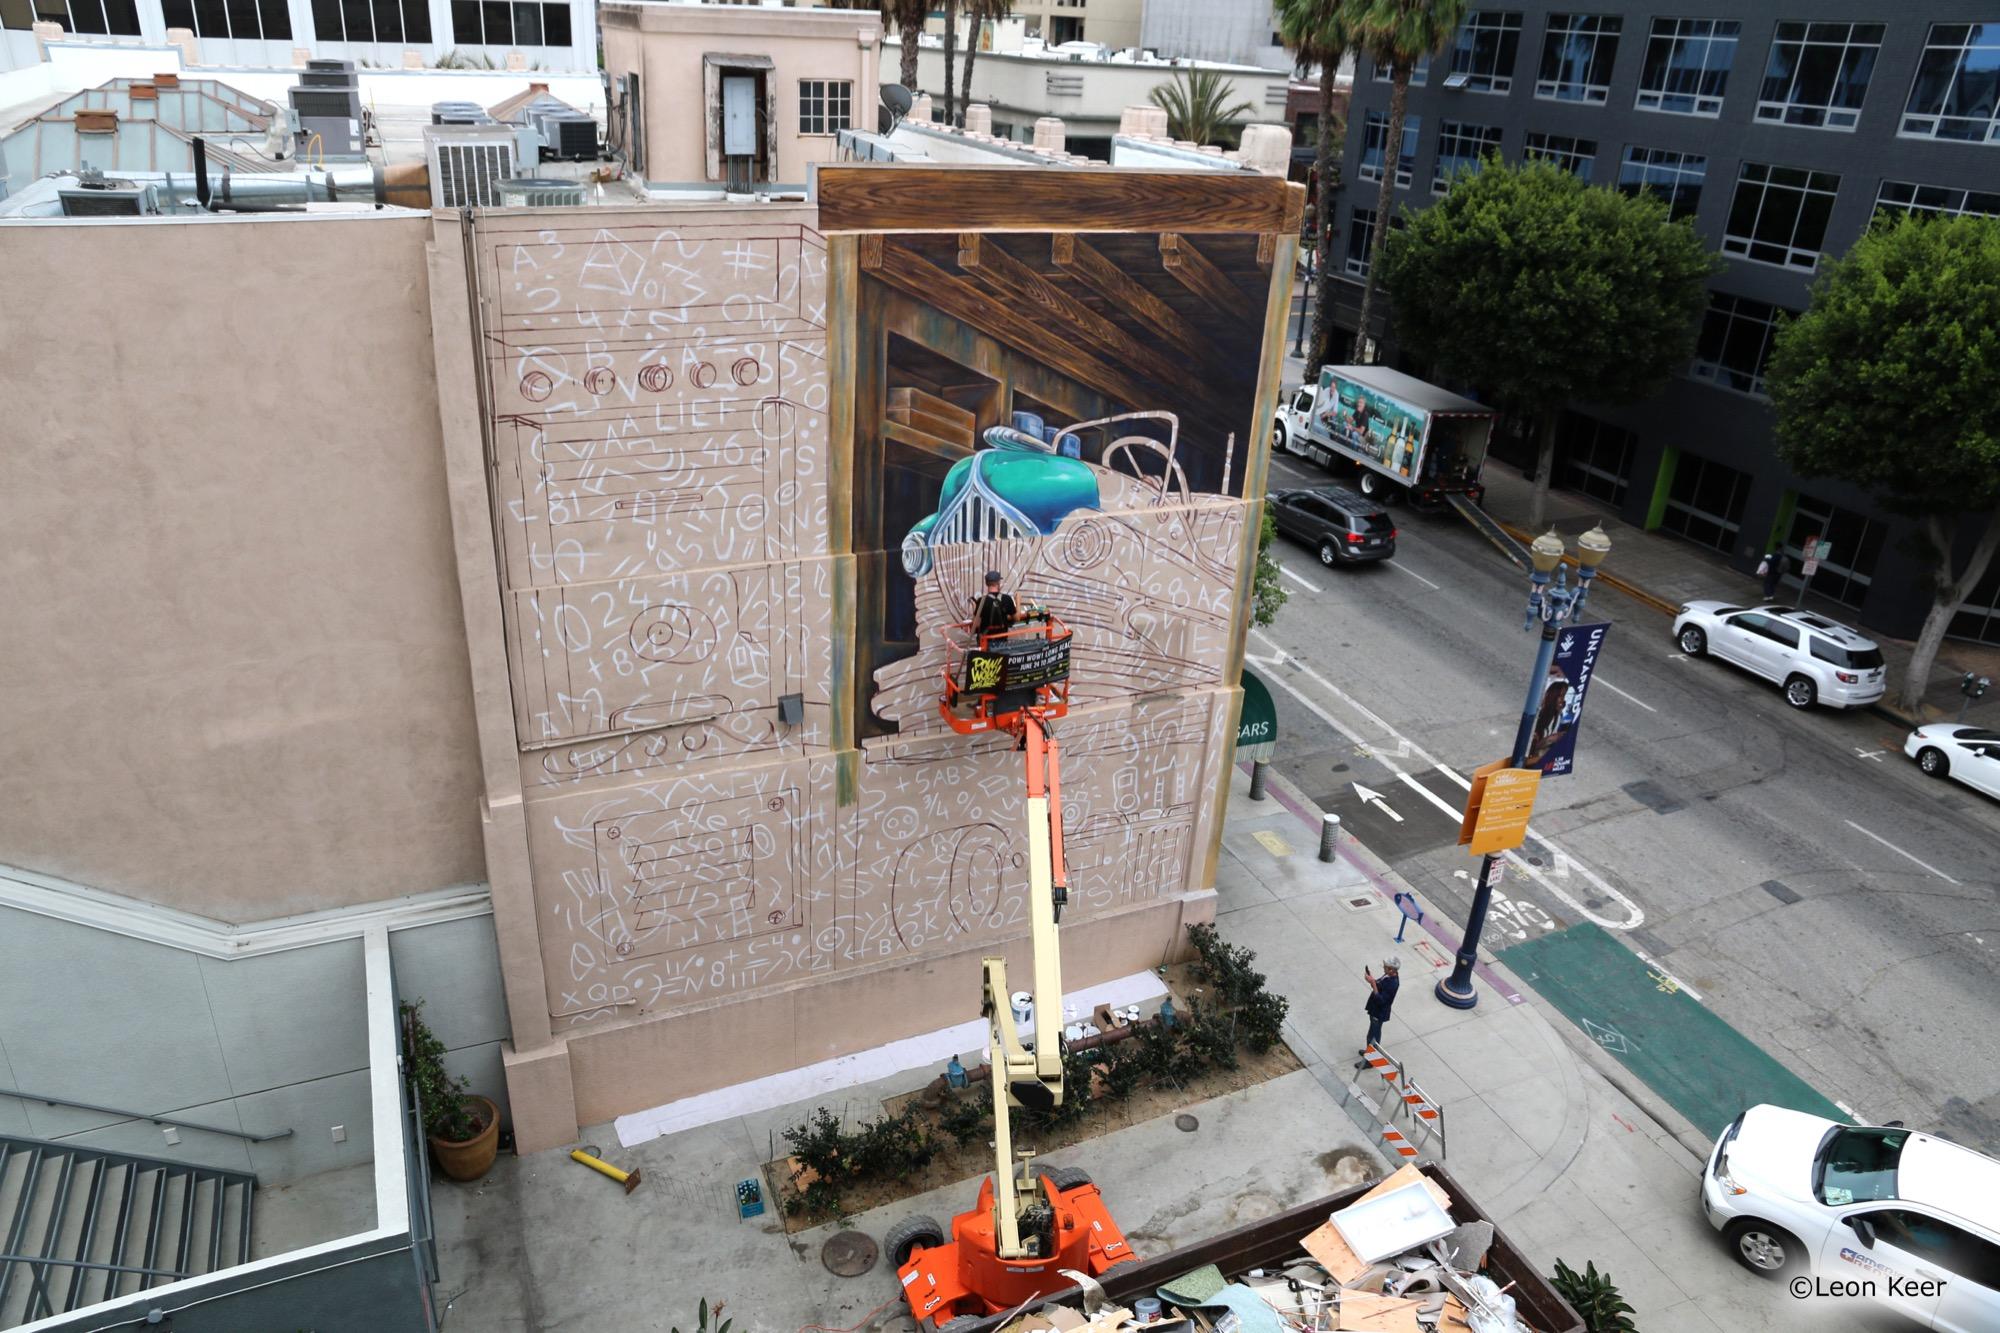 Leon Keer in Long Beach, California Artes & contextos powwow mural leonkeer 3d 42388266005 o